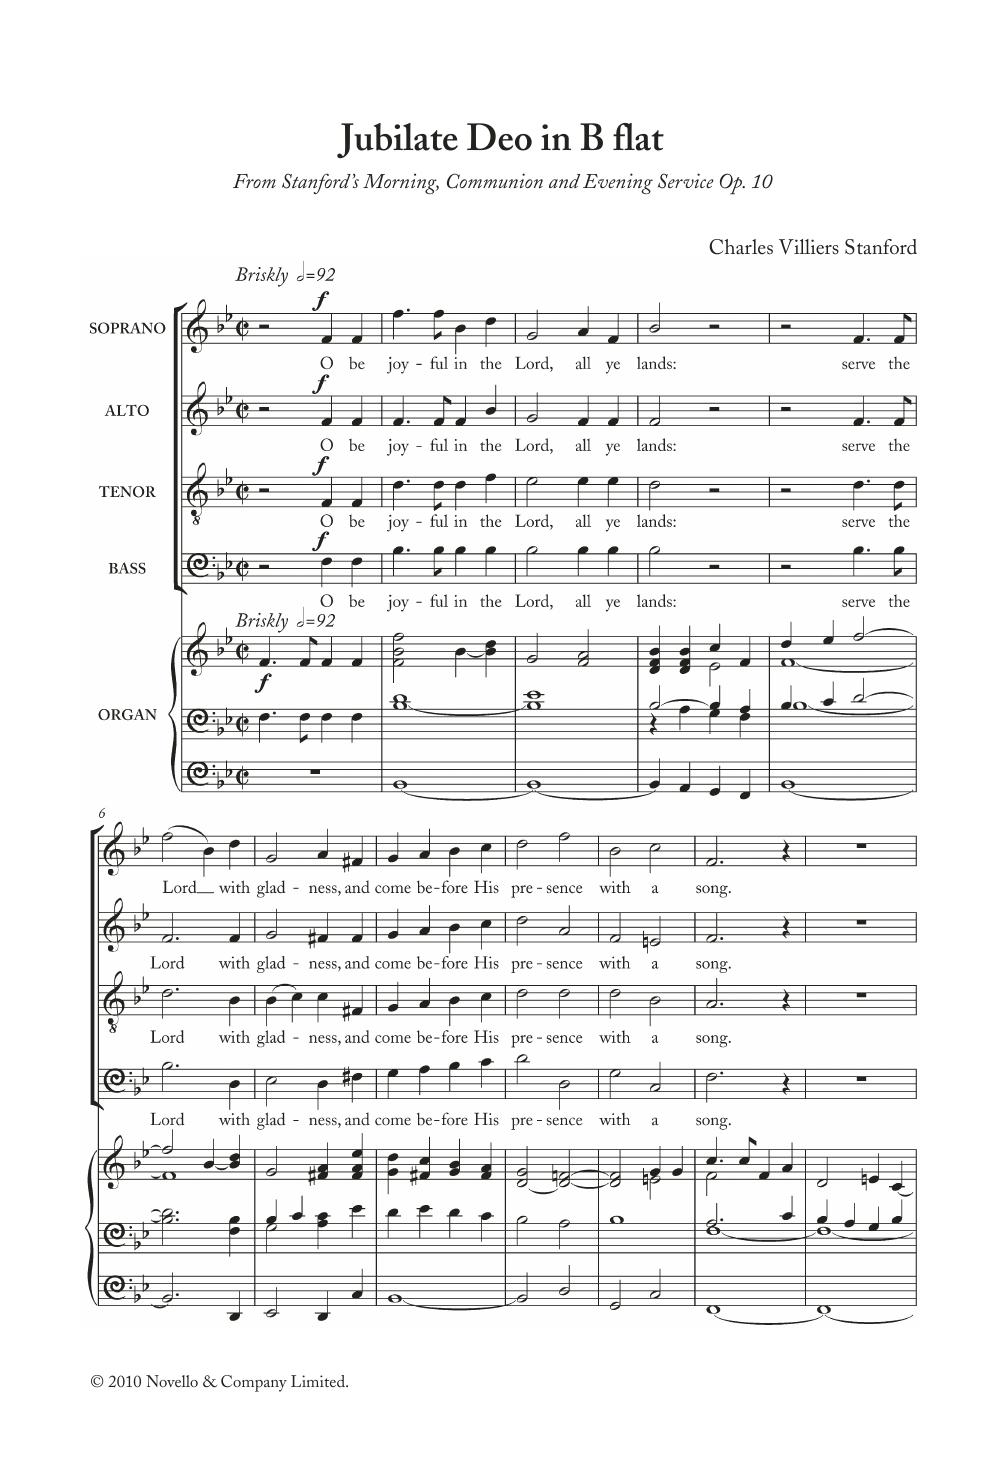 Charles Villiers Stanford - Jubilate Deo In B Flat, Op. 10